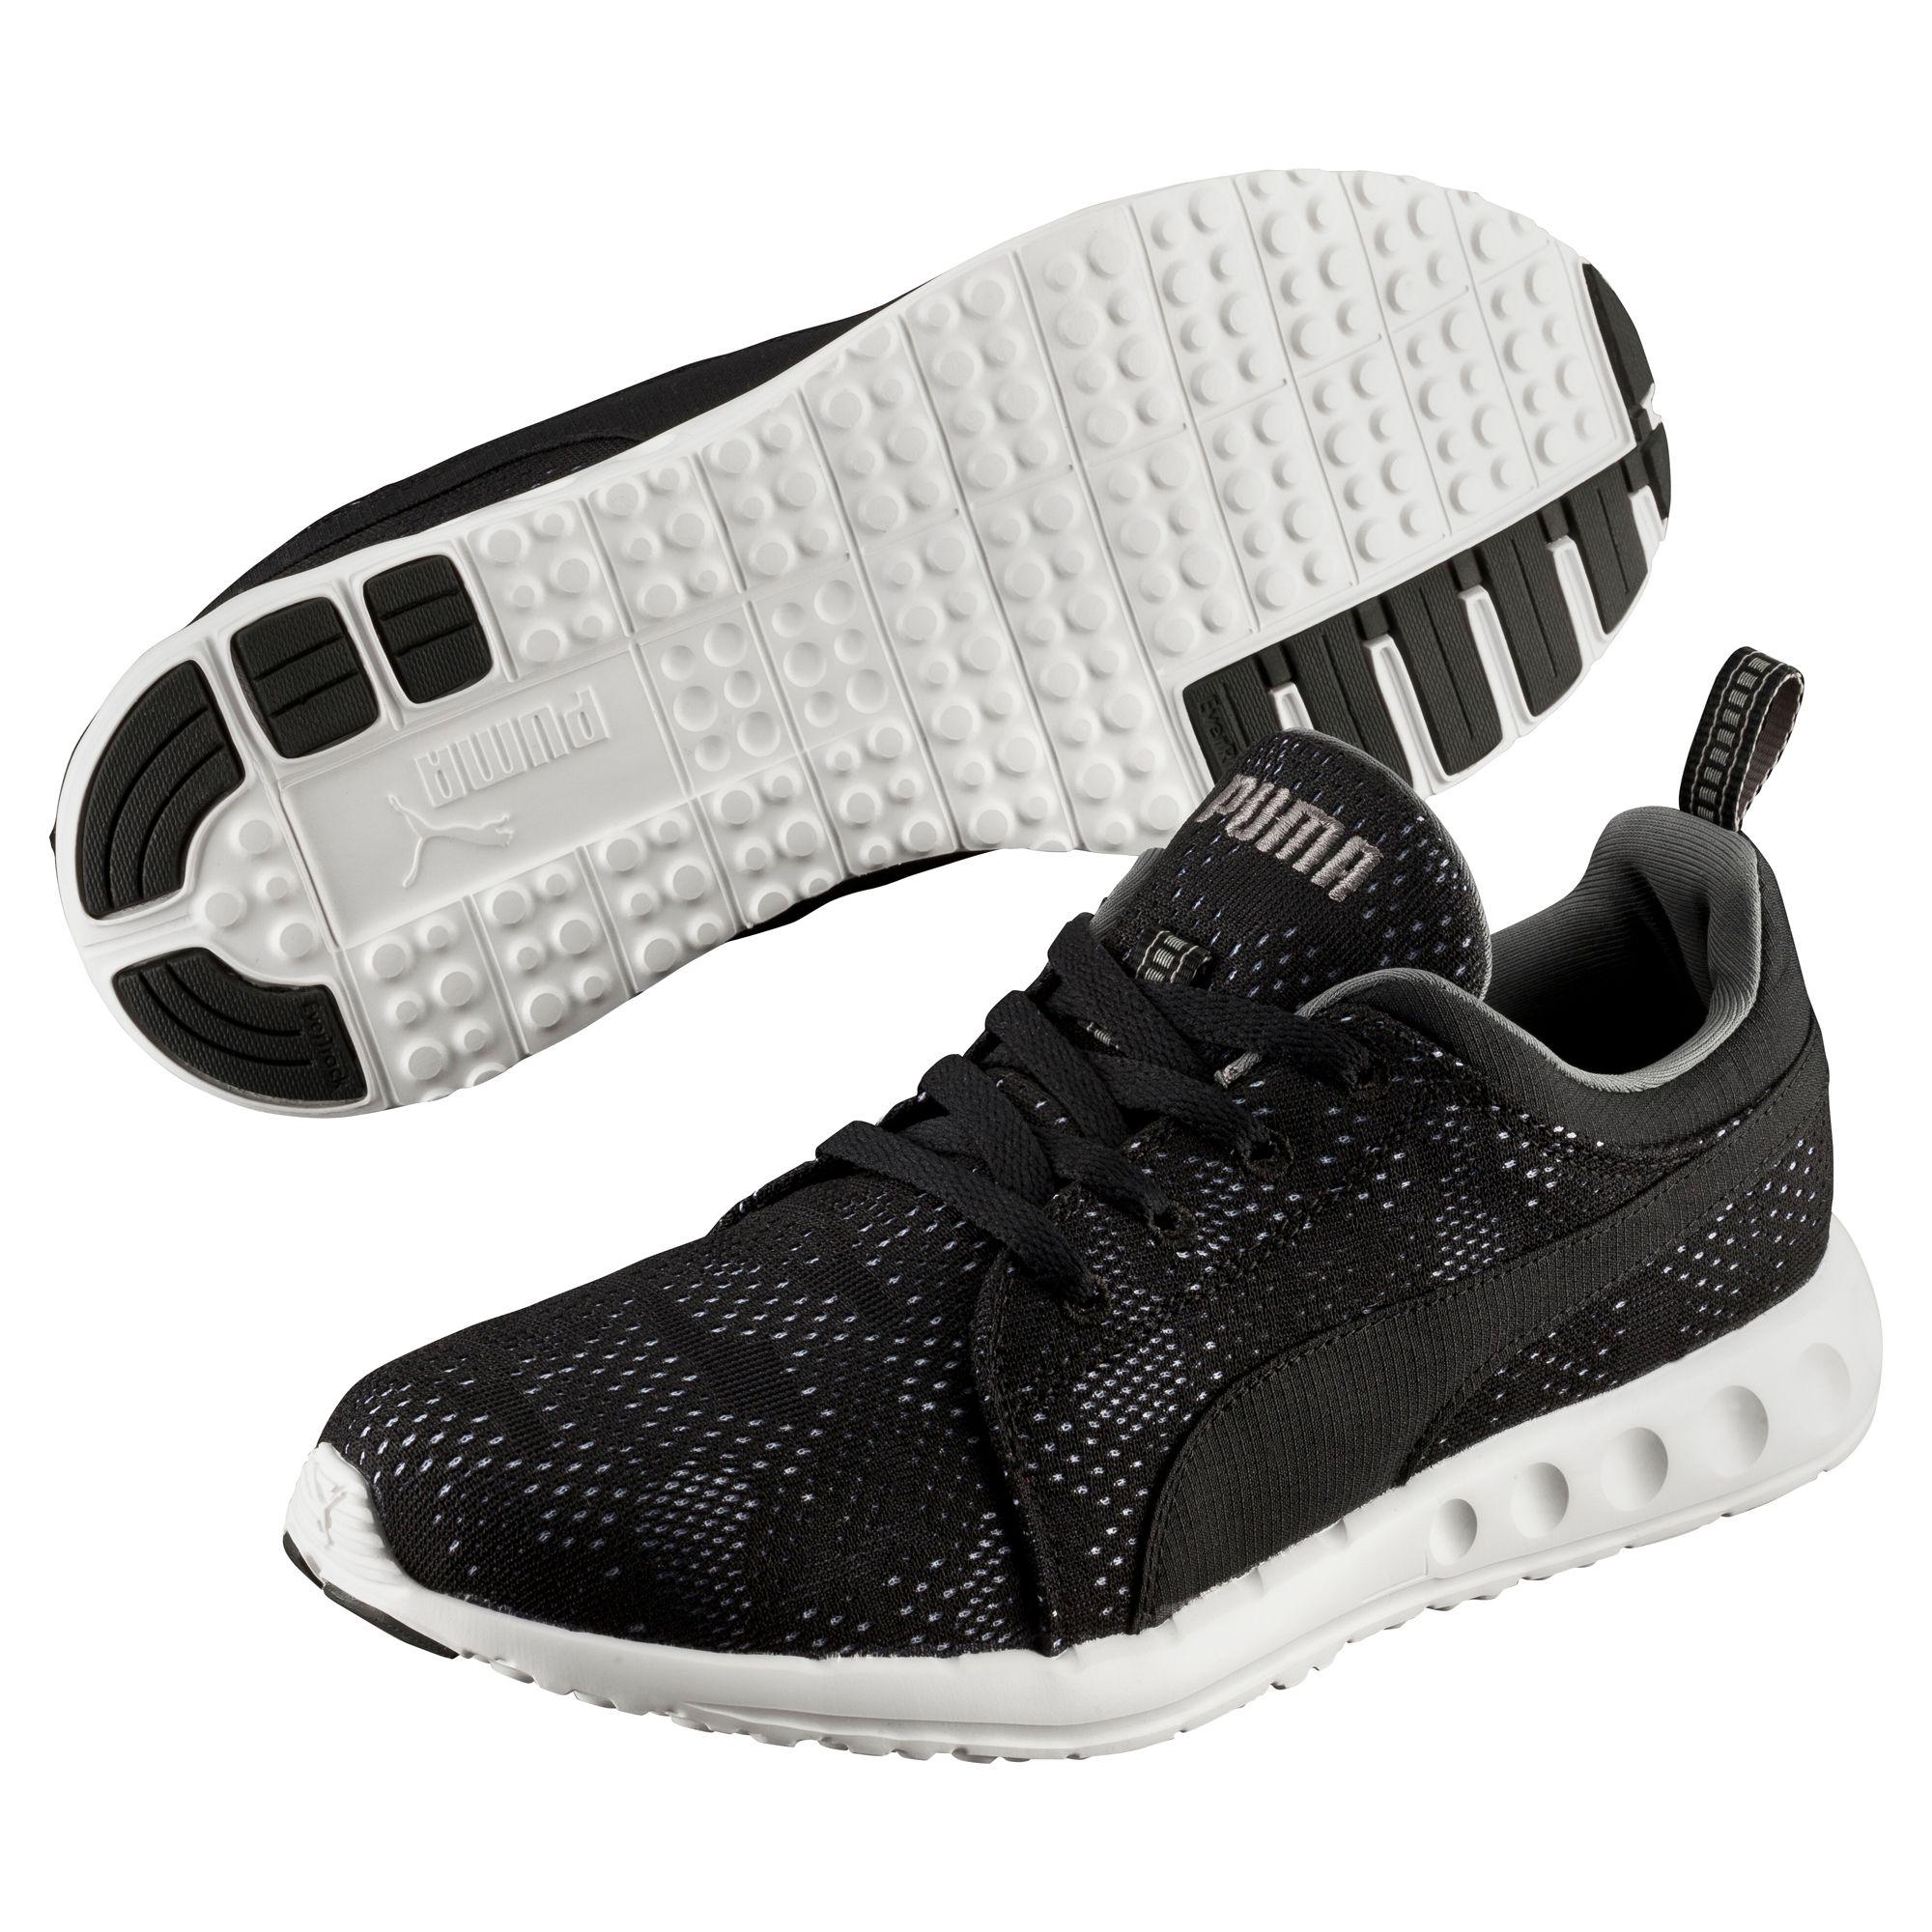 puma carson runner camo mesh running shoes footwear. Black Bedroom Furniture Sets. Home Design Ideas